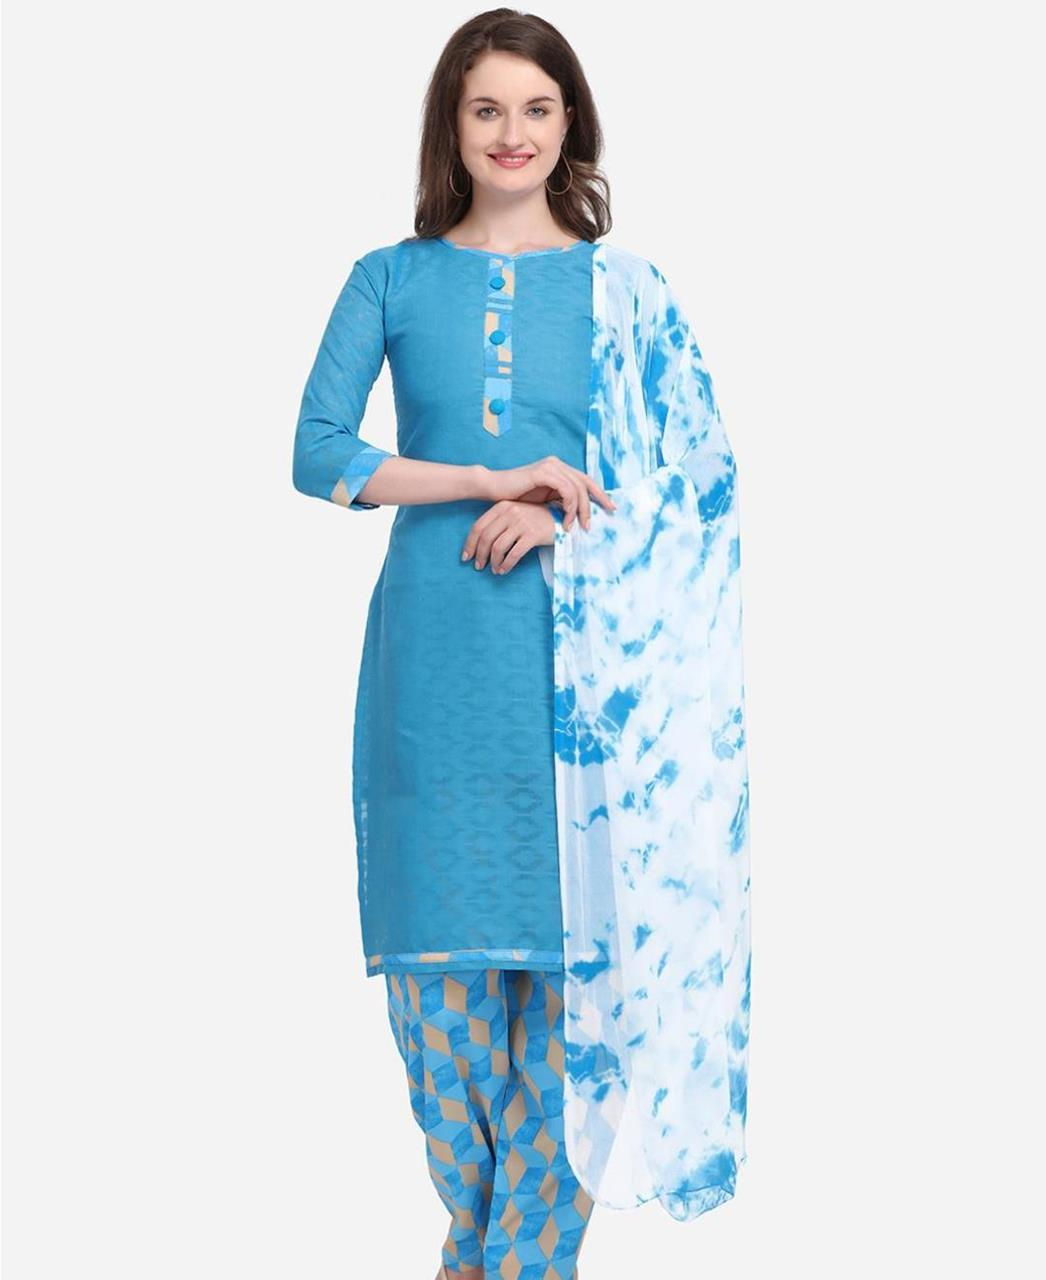 Embroidered Cotton Patiyala Suit Salwar in Sky Blue